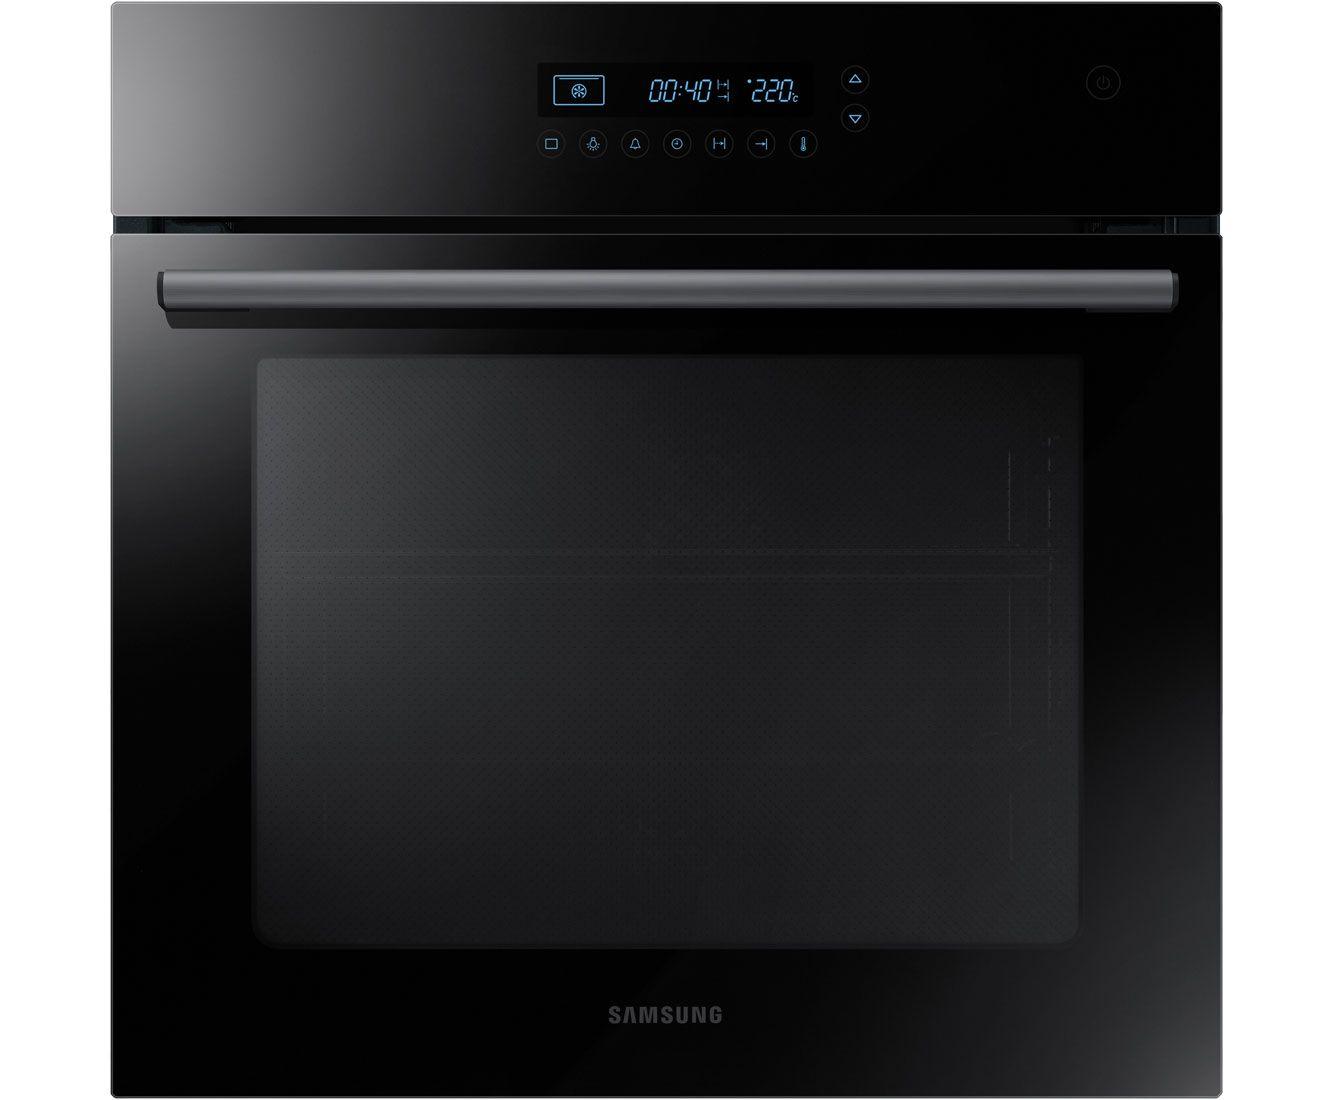 Delightful Black Built In Oven Part - 5: Samsung NV70H5587CB Built In Electric Single Oven - Black / Glass